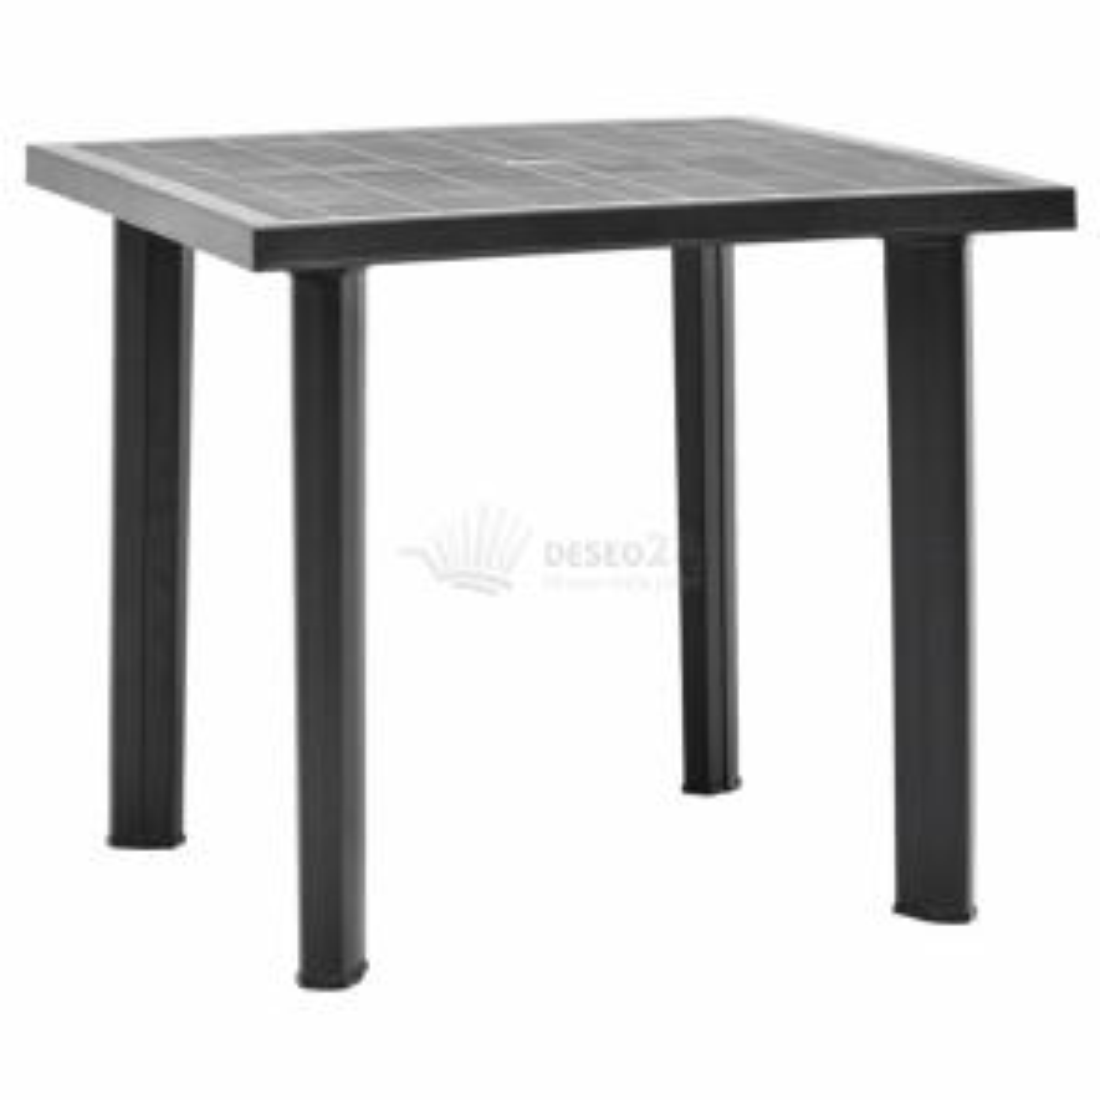 vidaXL Zahradní stůl antracitový 80 x 75 x 72 cm plast [48804]